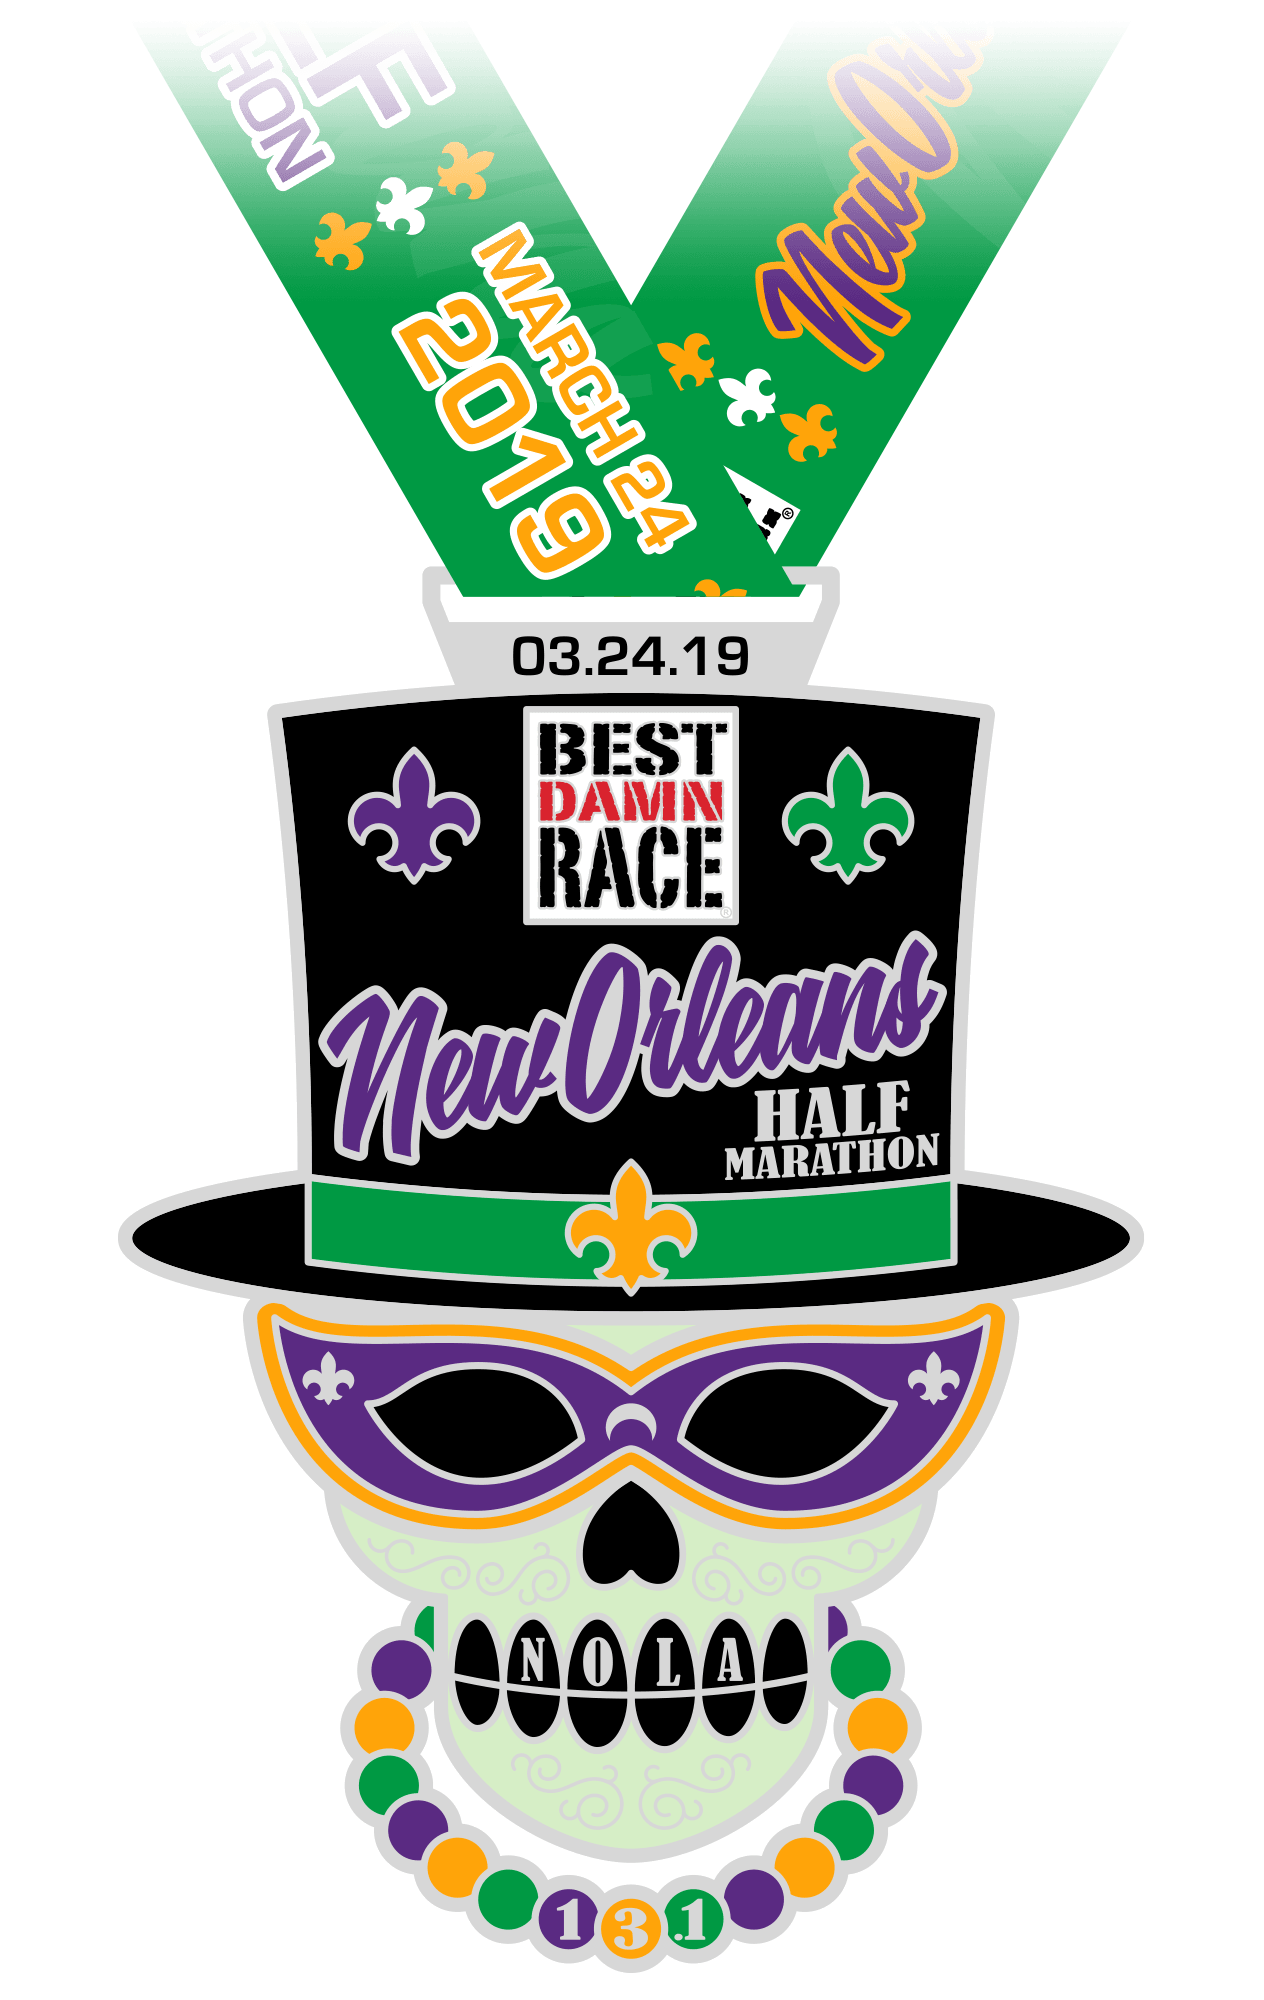 Half Marathon Medal - New Orleans 2018 - Best Damn Race